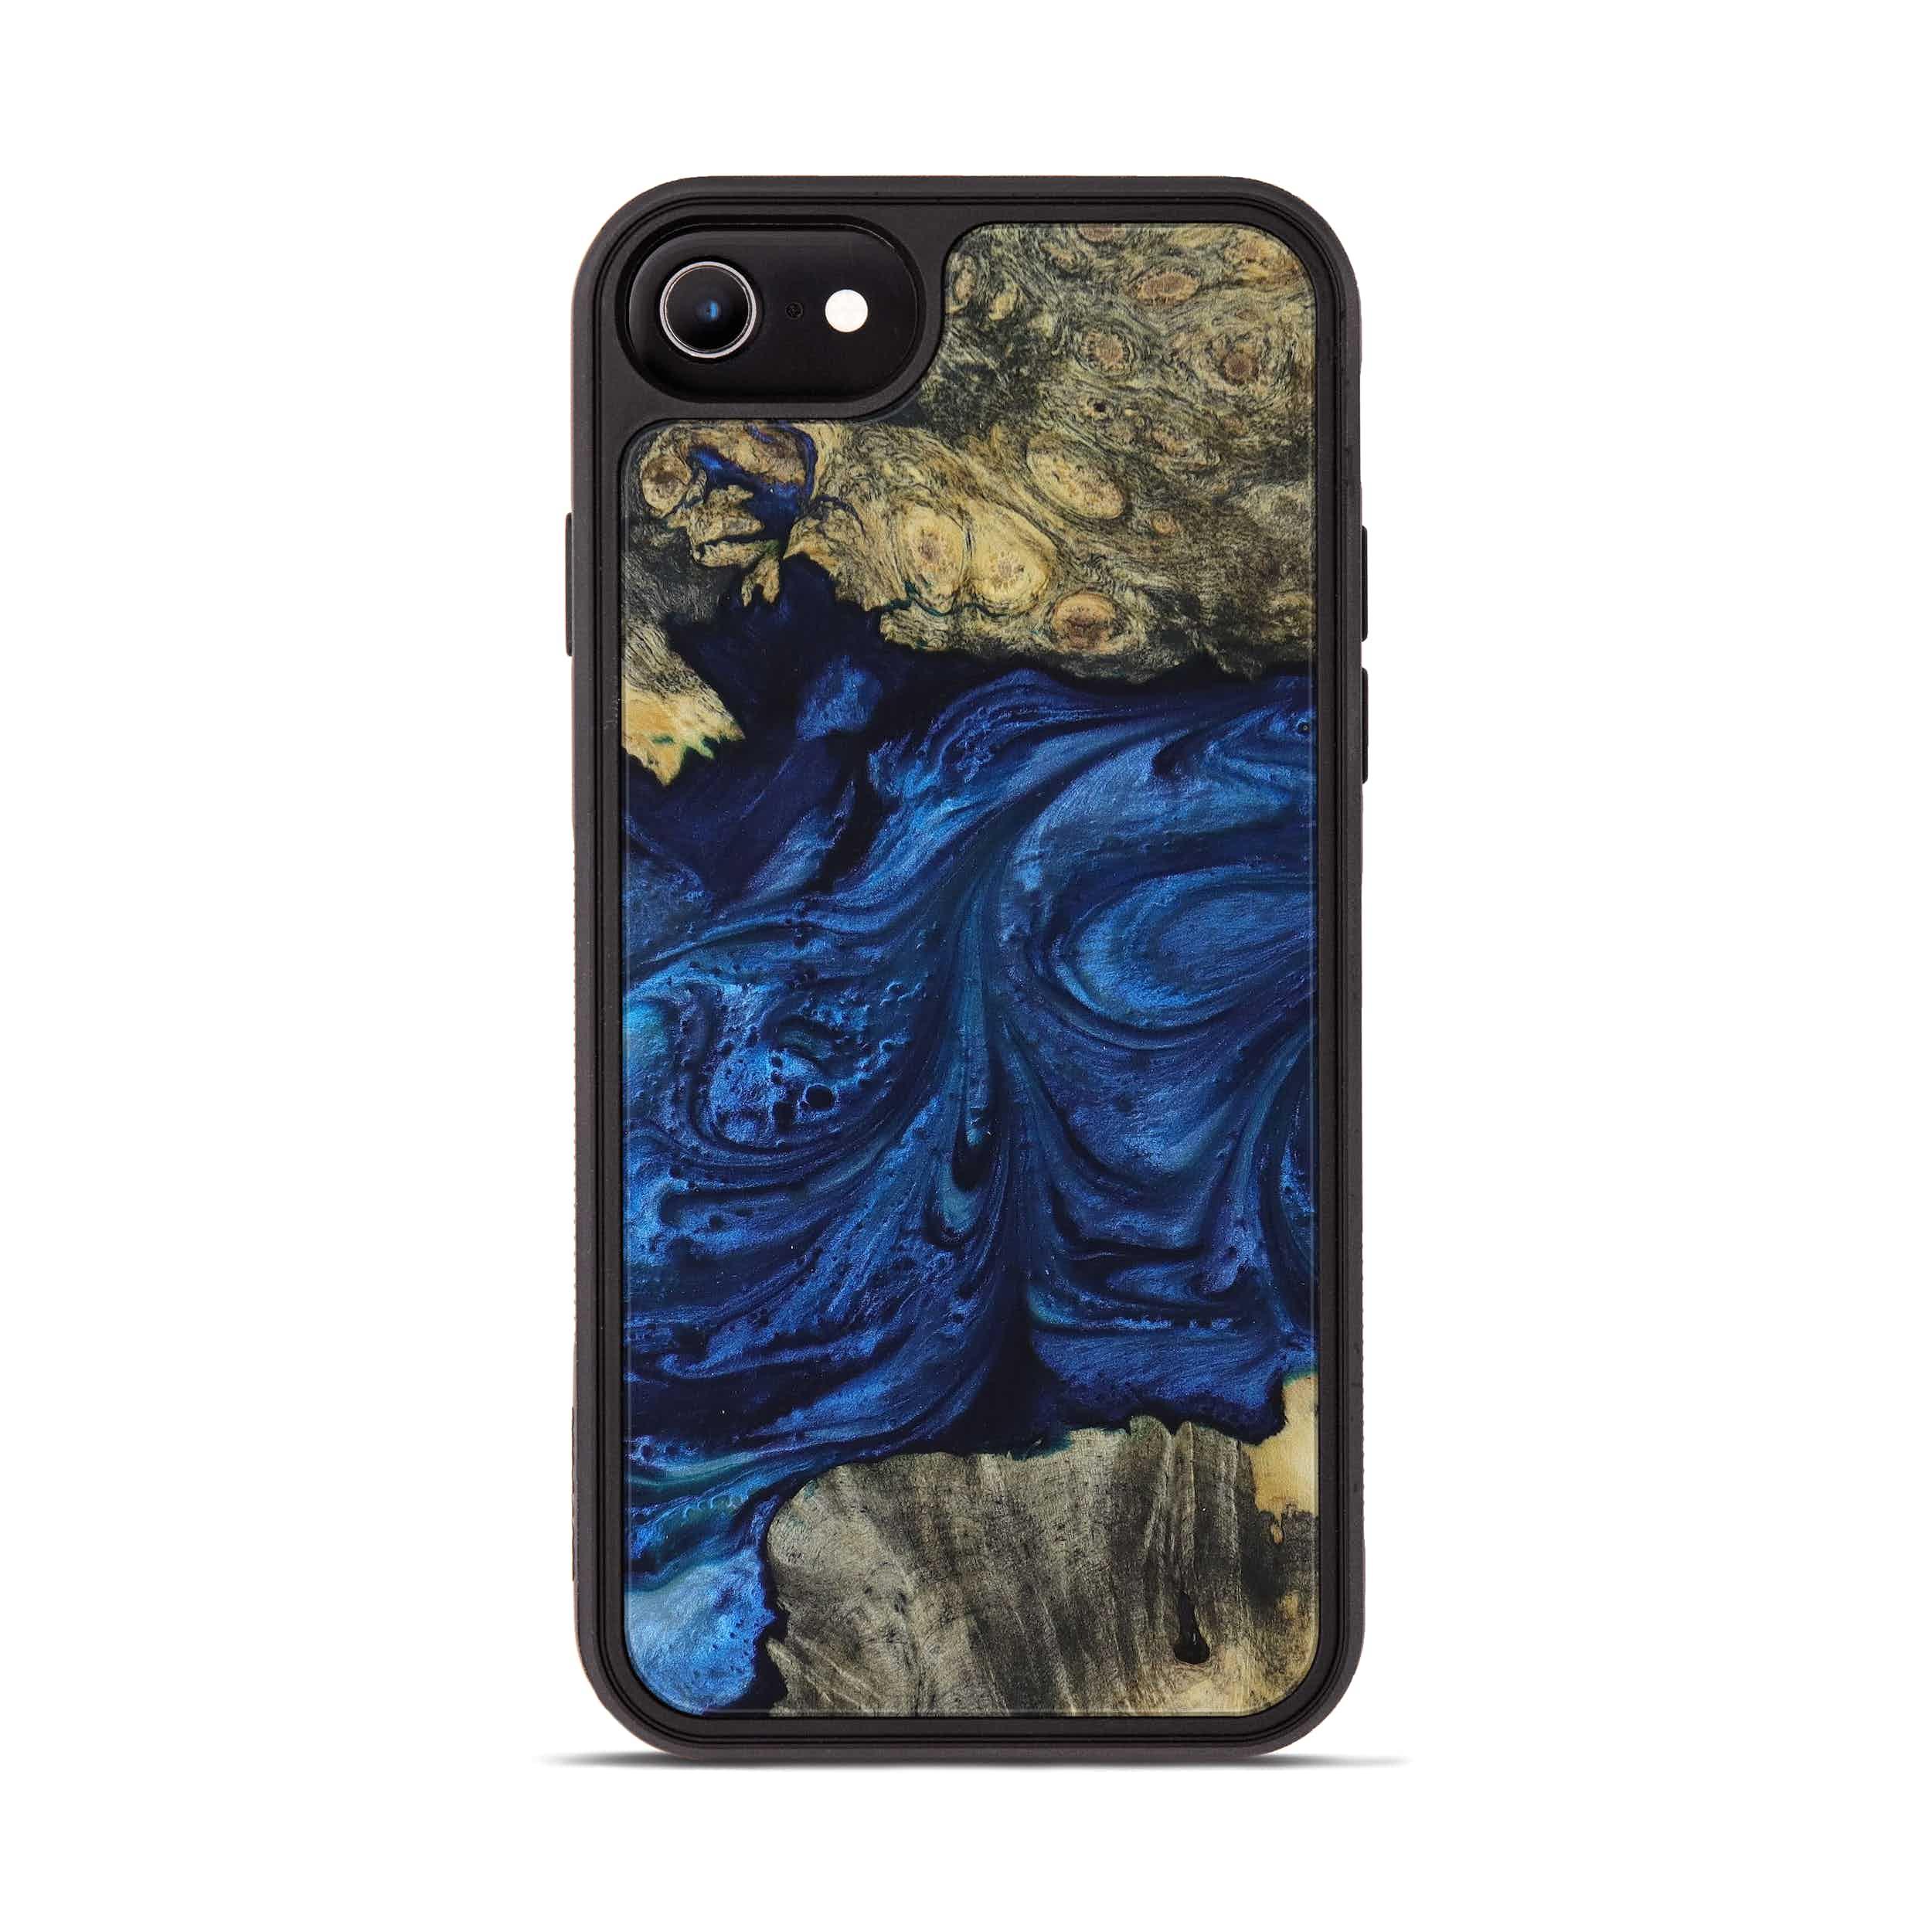 iPhone 6s Wood+Resin Phone Case - Kalpit (Dark Blue, 396090)